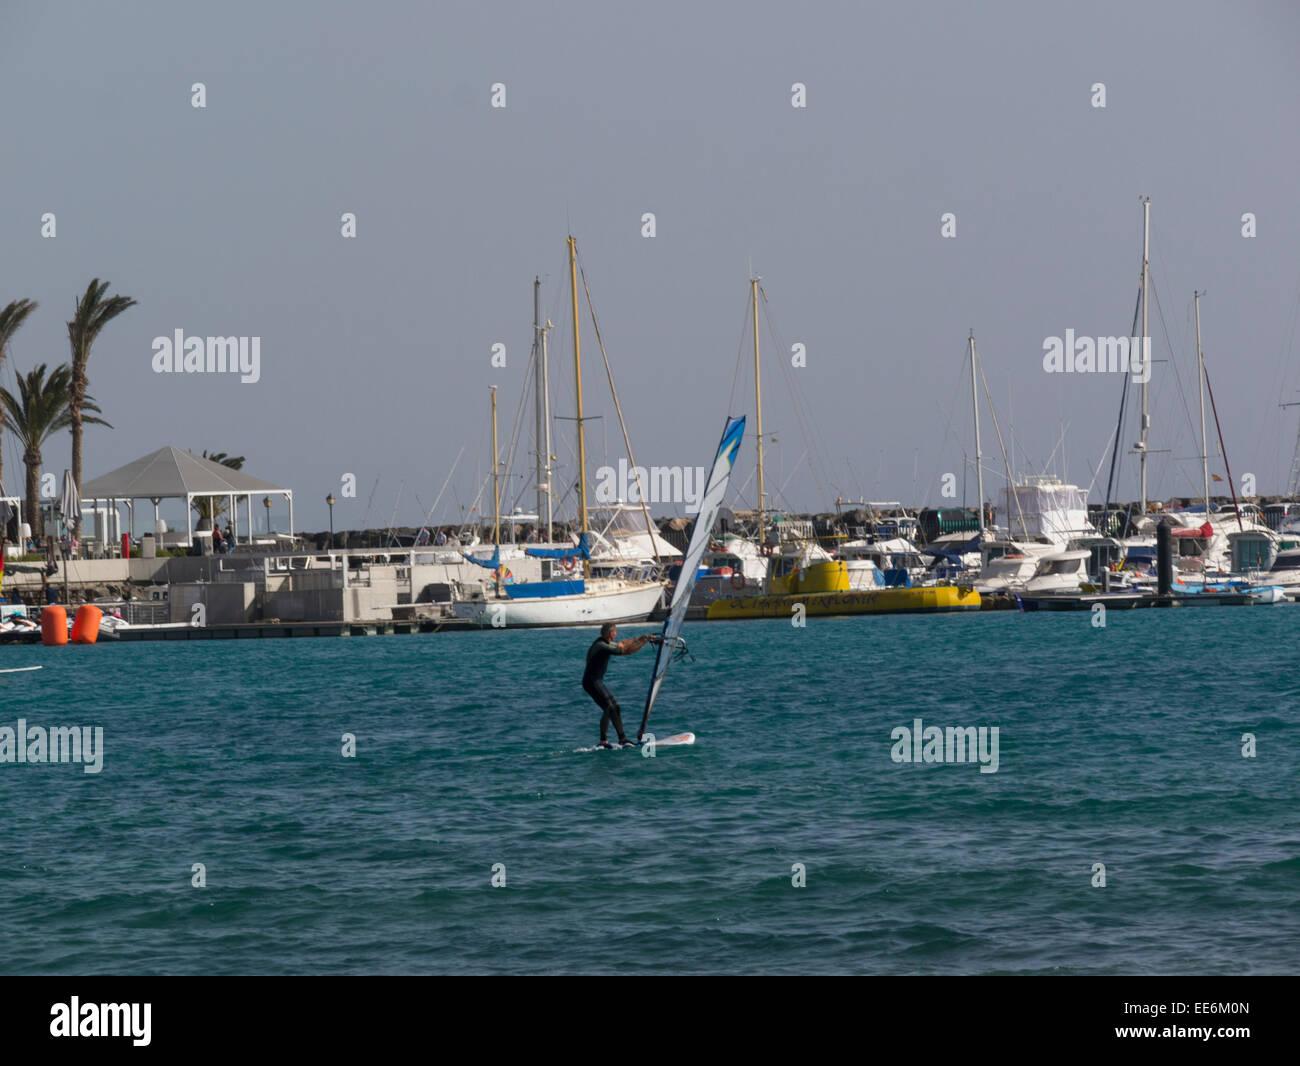 Homme planche à Caleta de Fuste Fuerteventura Canaries Photo Stock